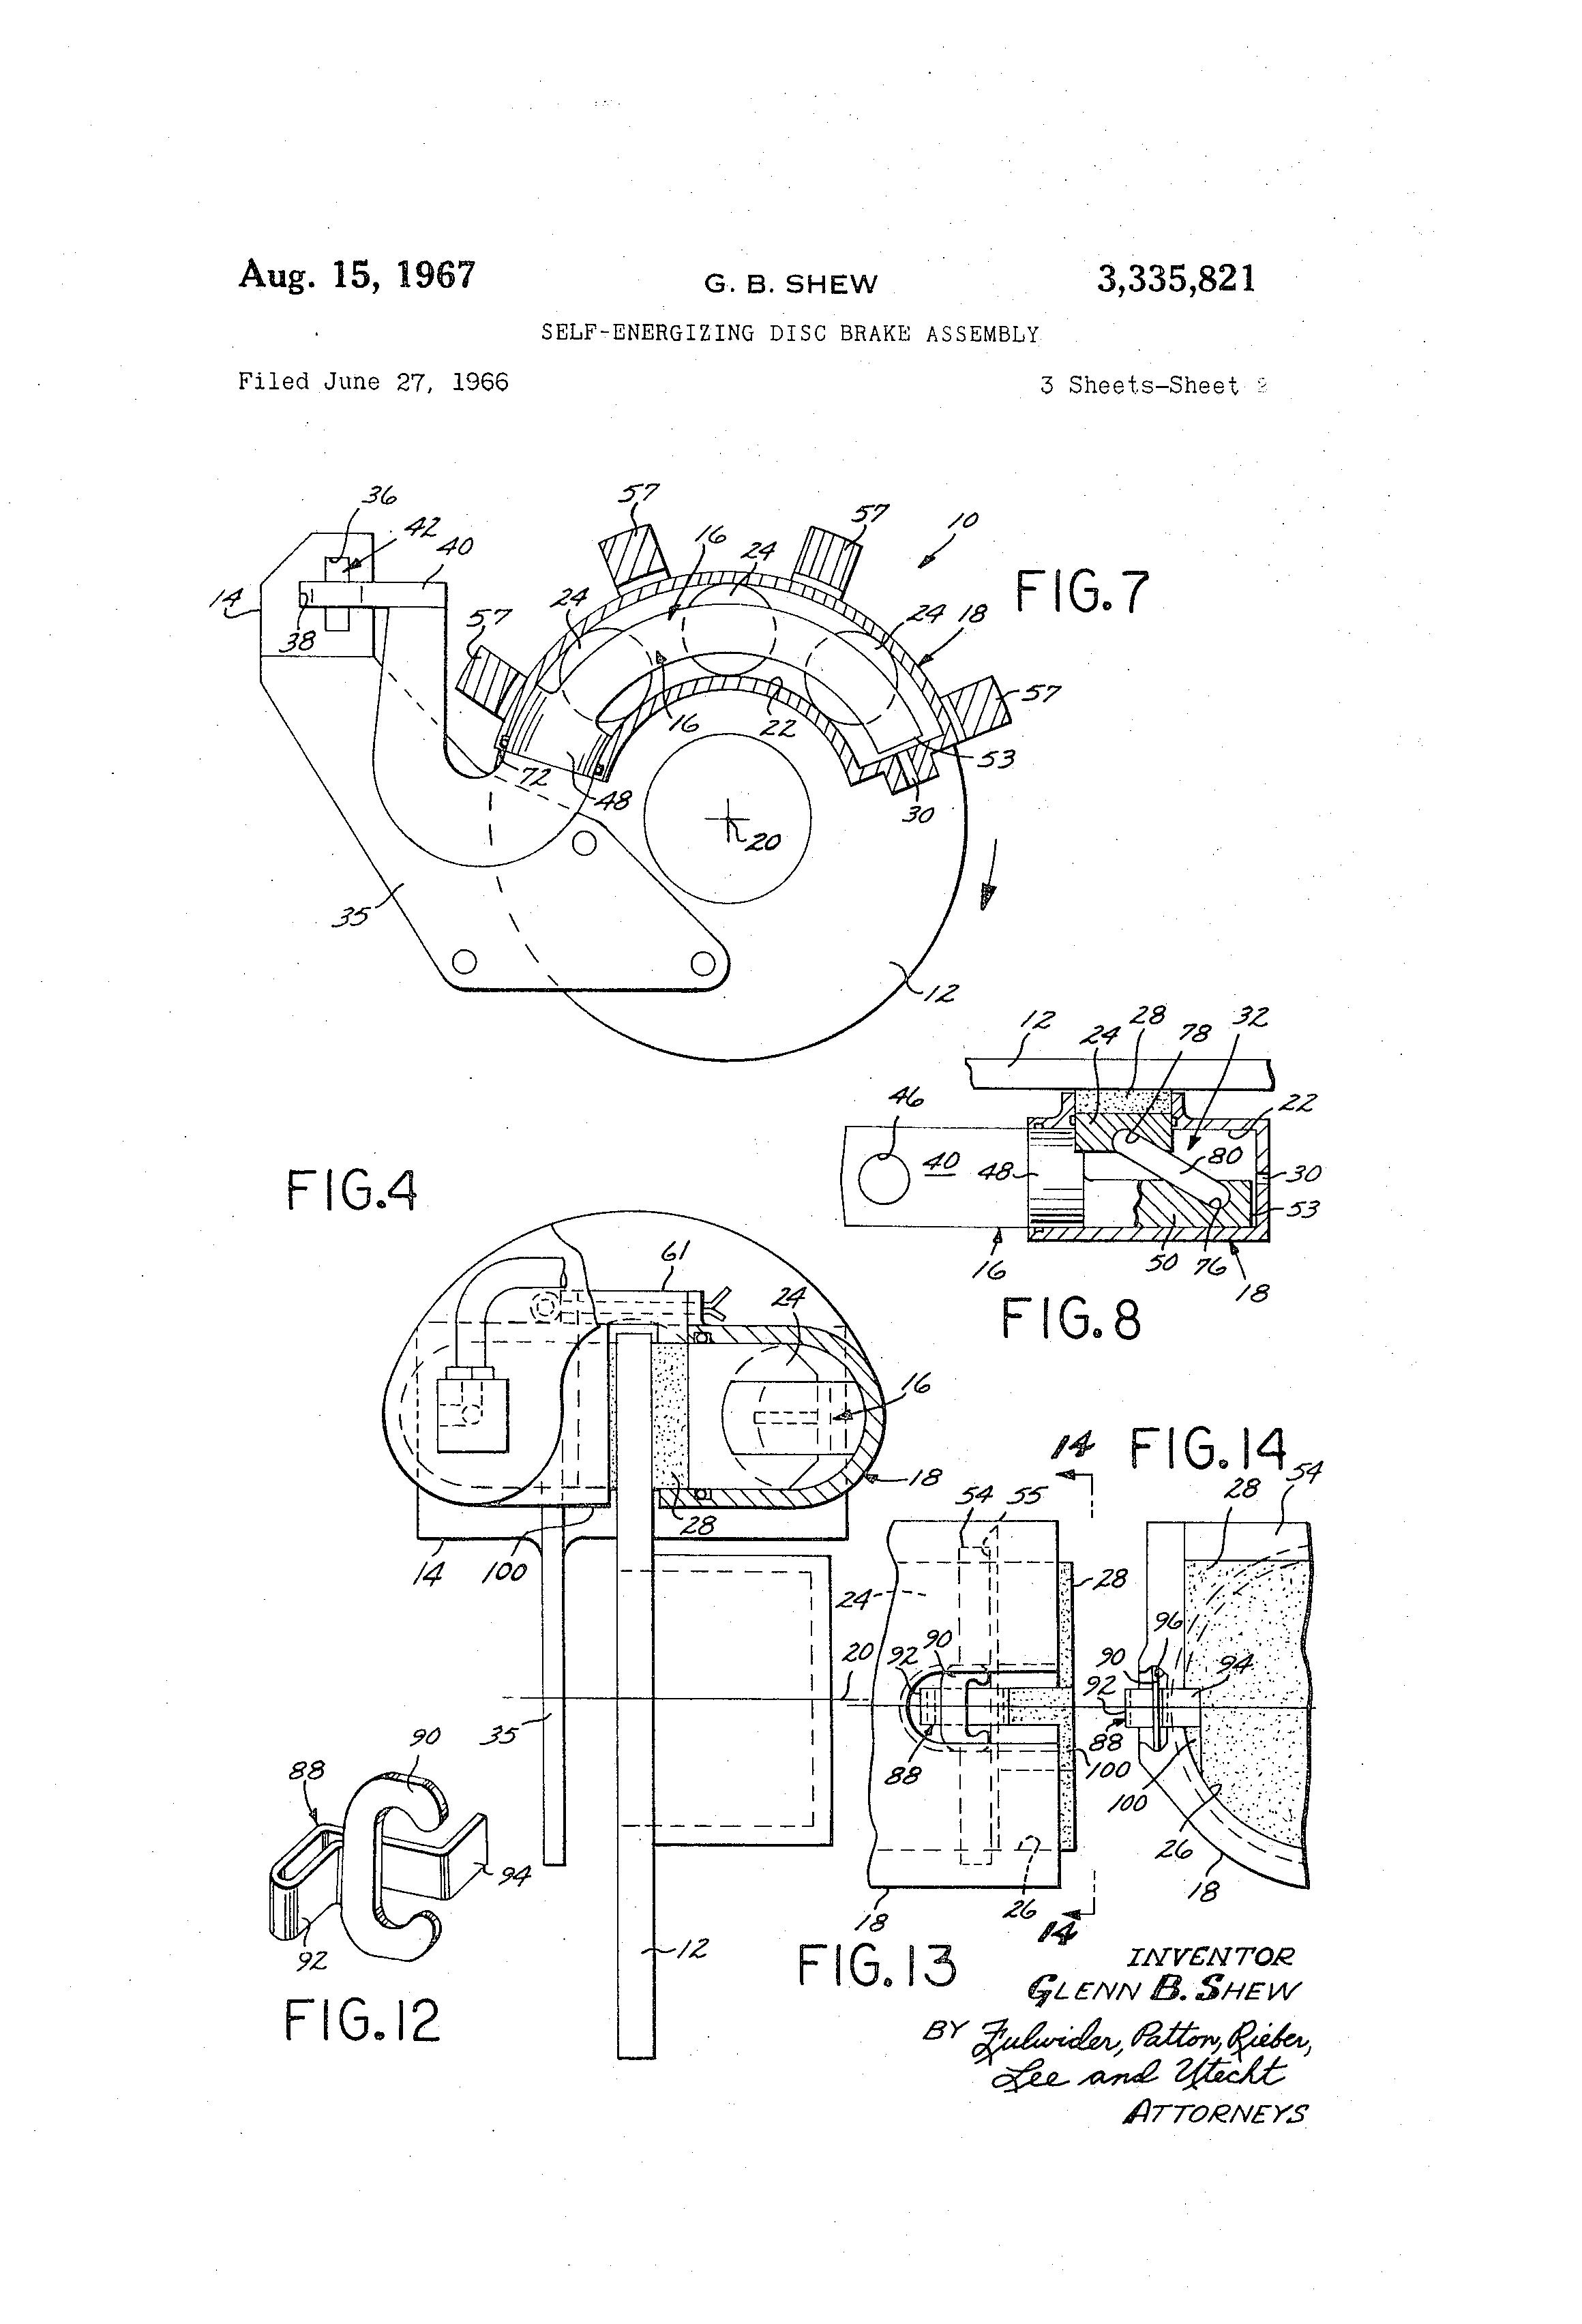 Us3335821 Self Energizing Disc Brake Assembly Diagram Patent Drawing